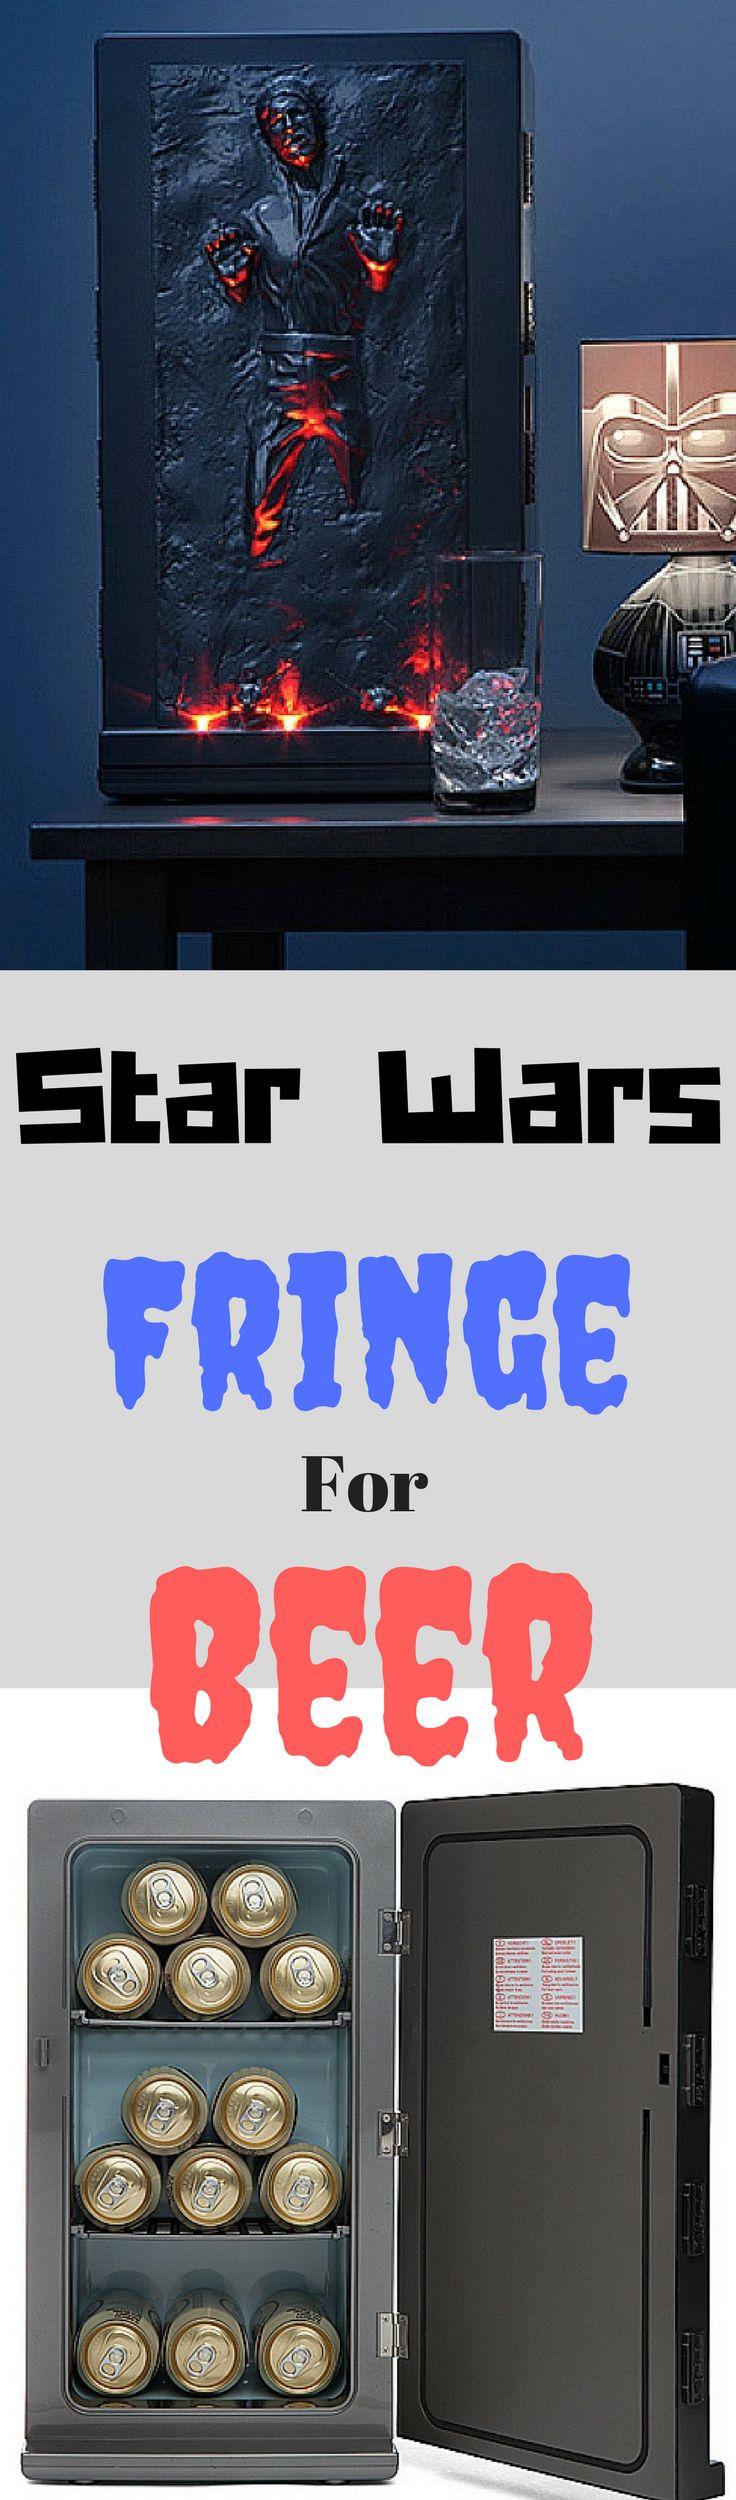 Star Wars Han Solo Fridge For Beer #starwars #hansolo #fringe #beer